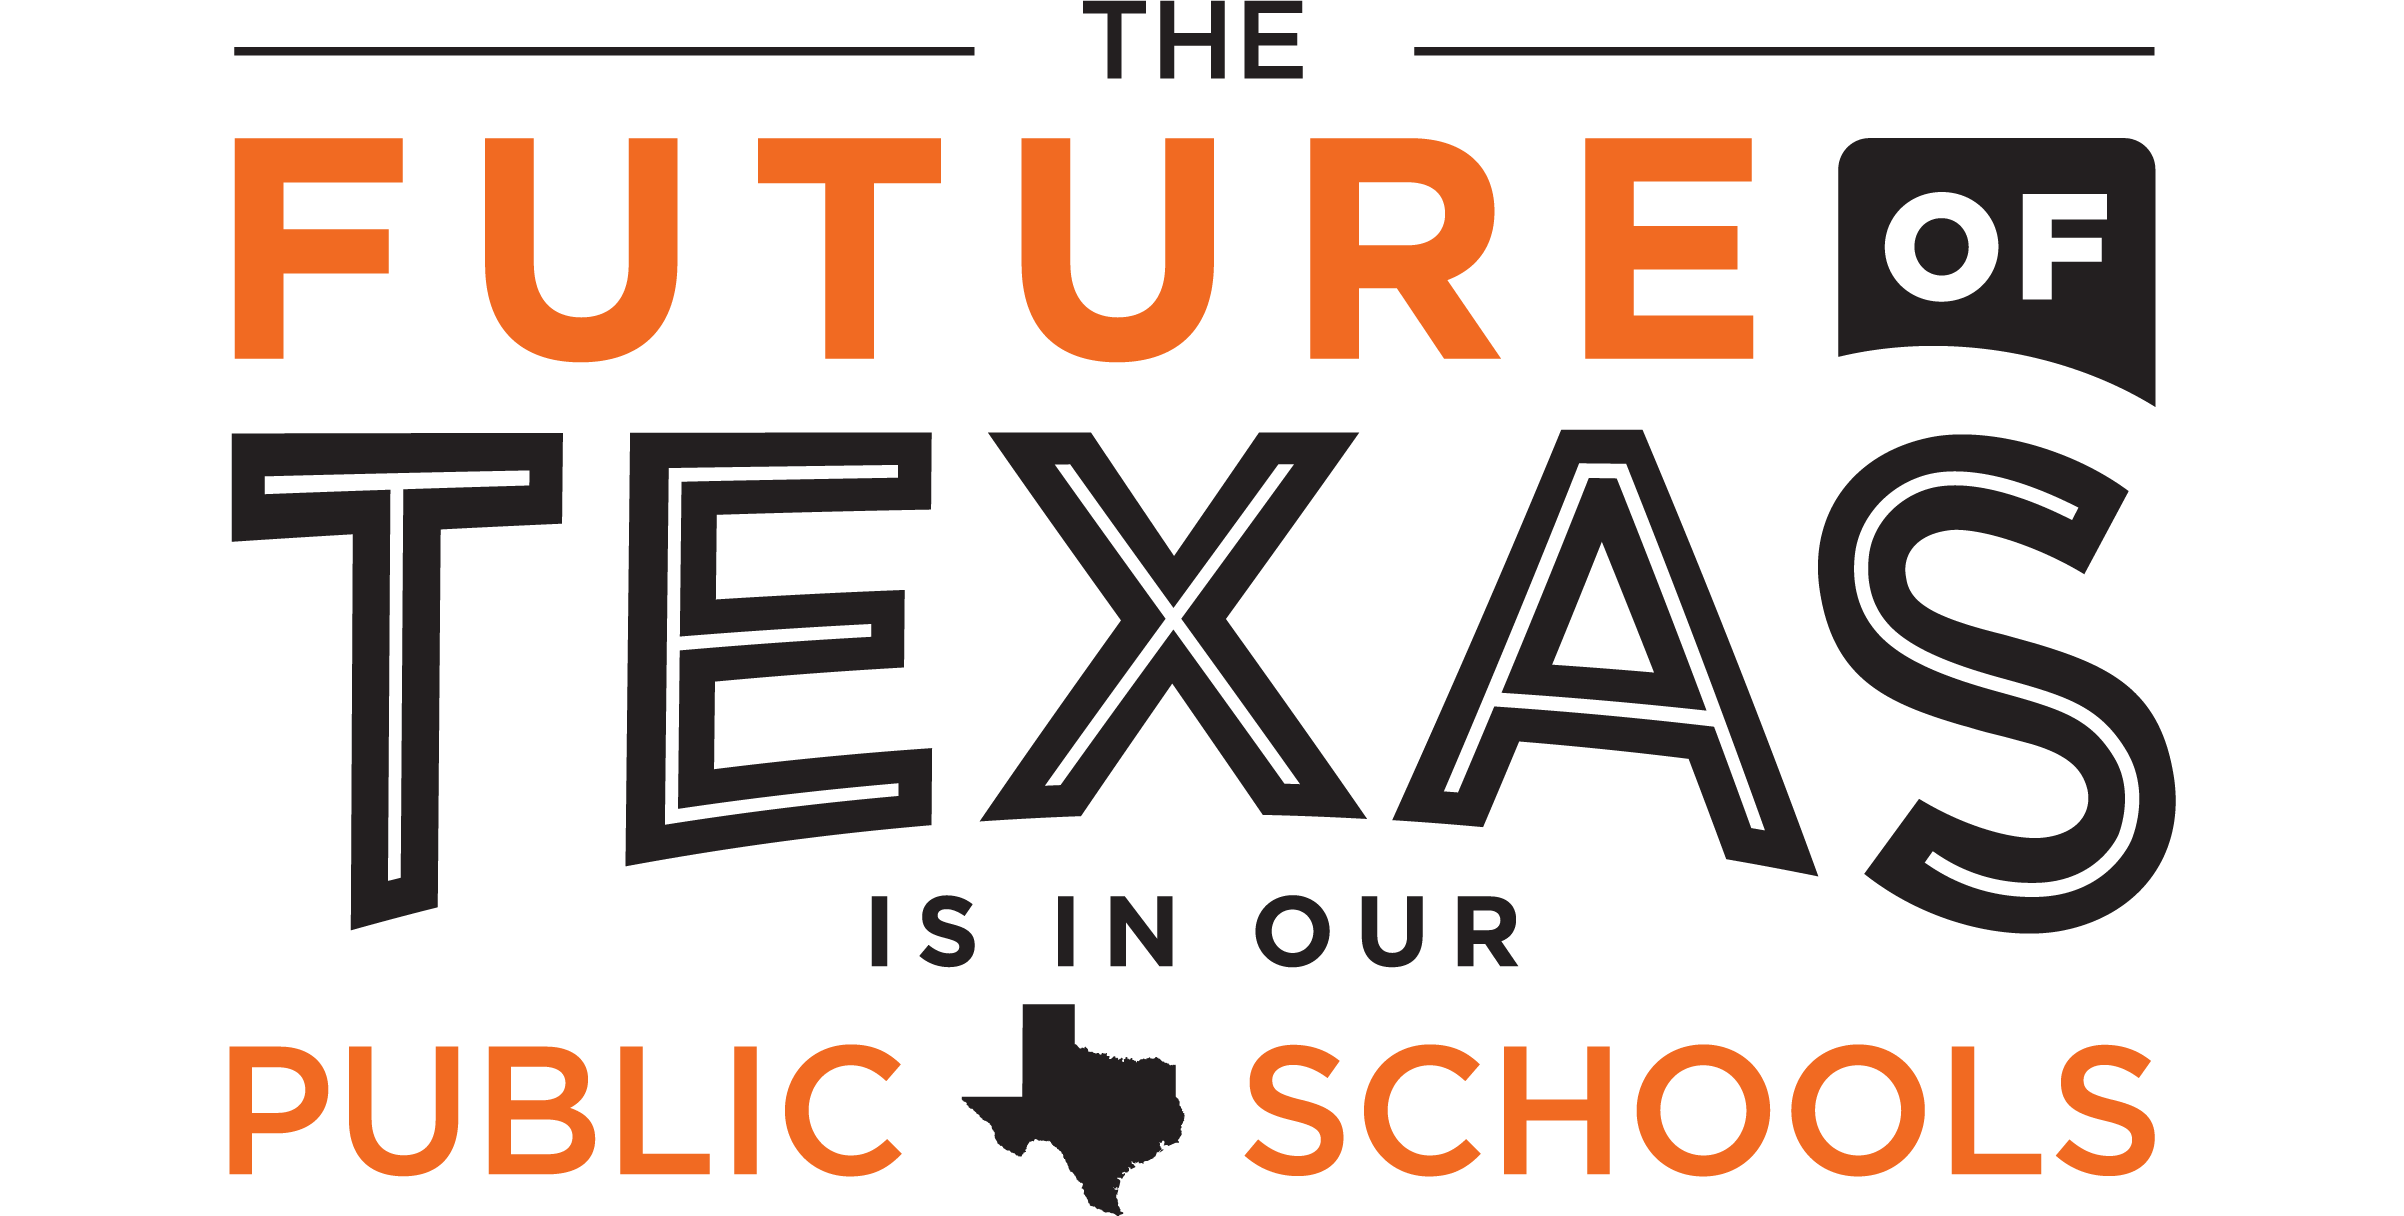 Raise Your Hand Texas slogan